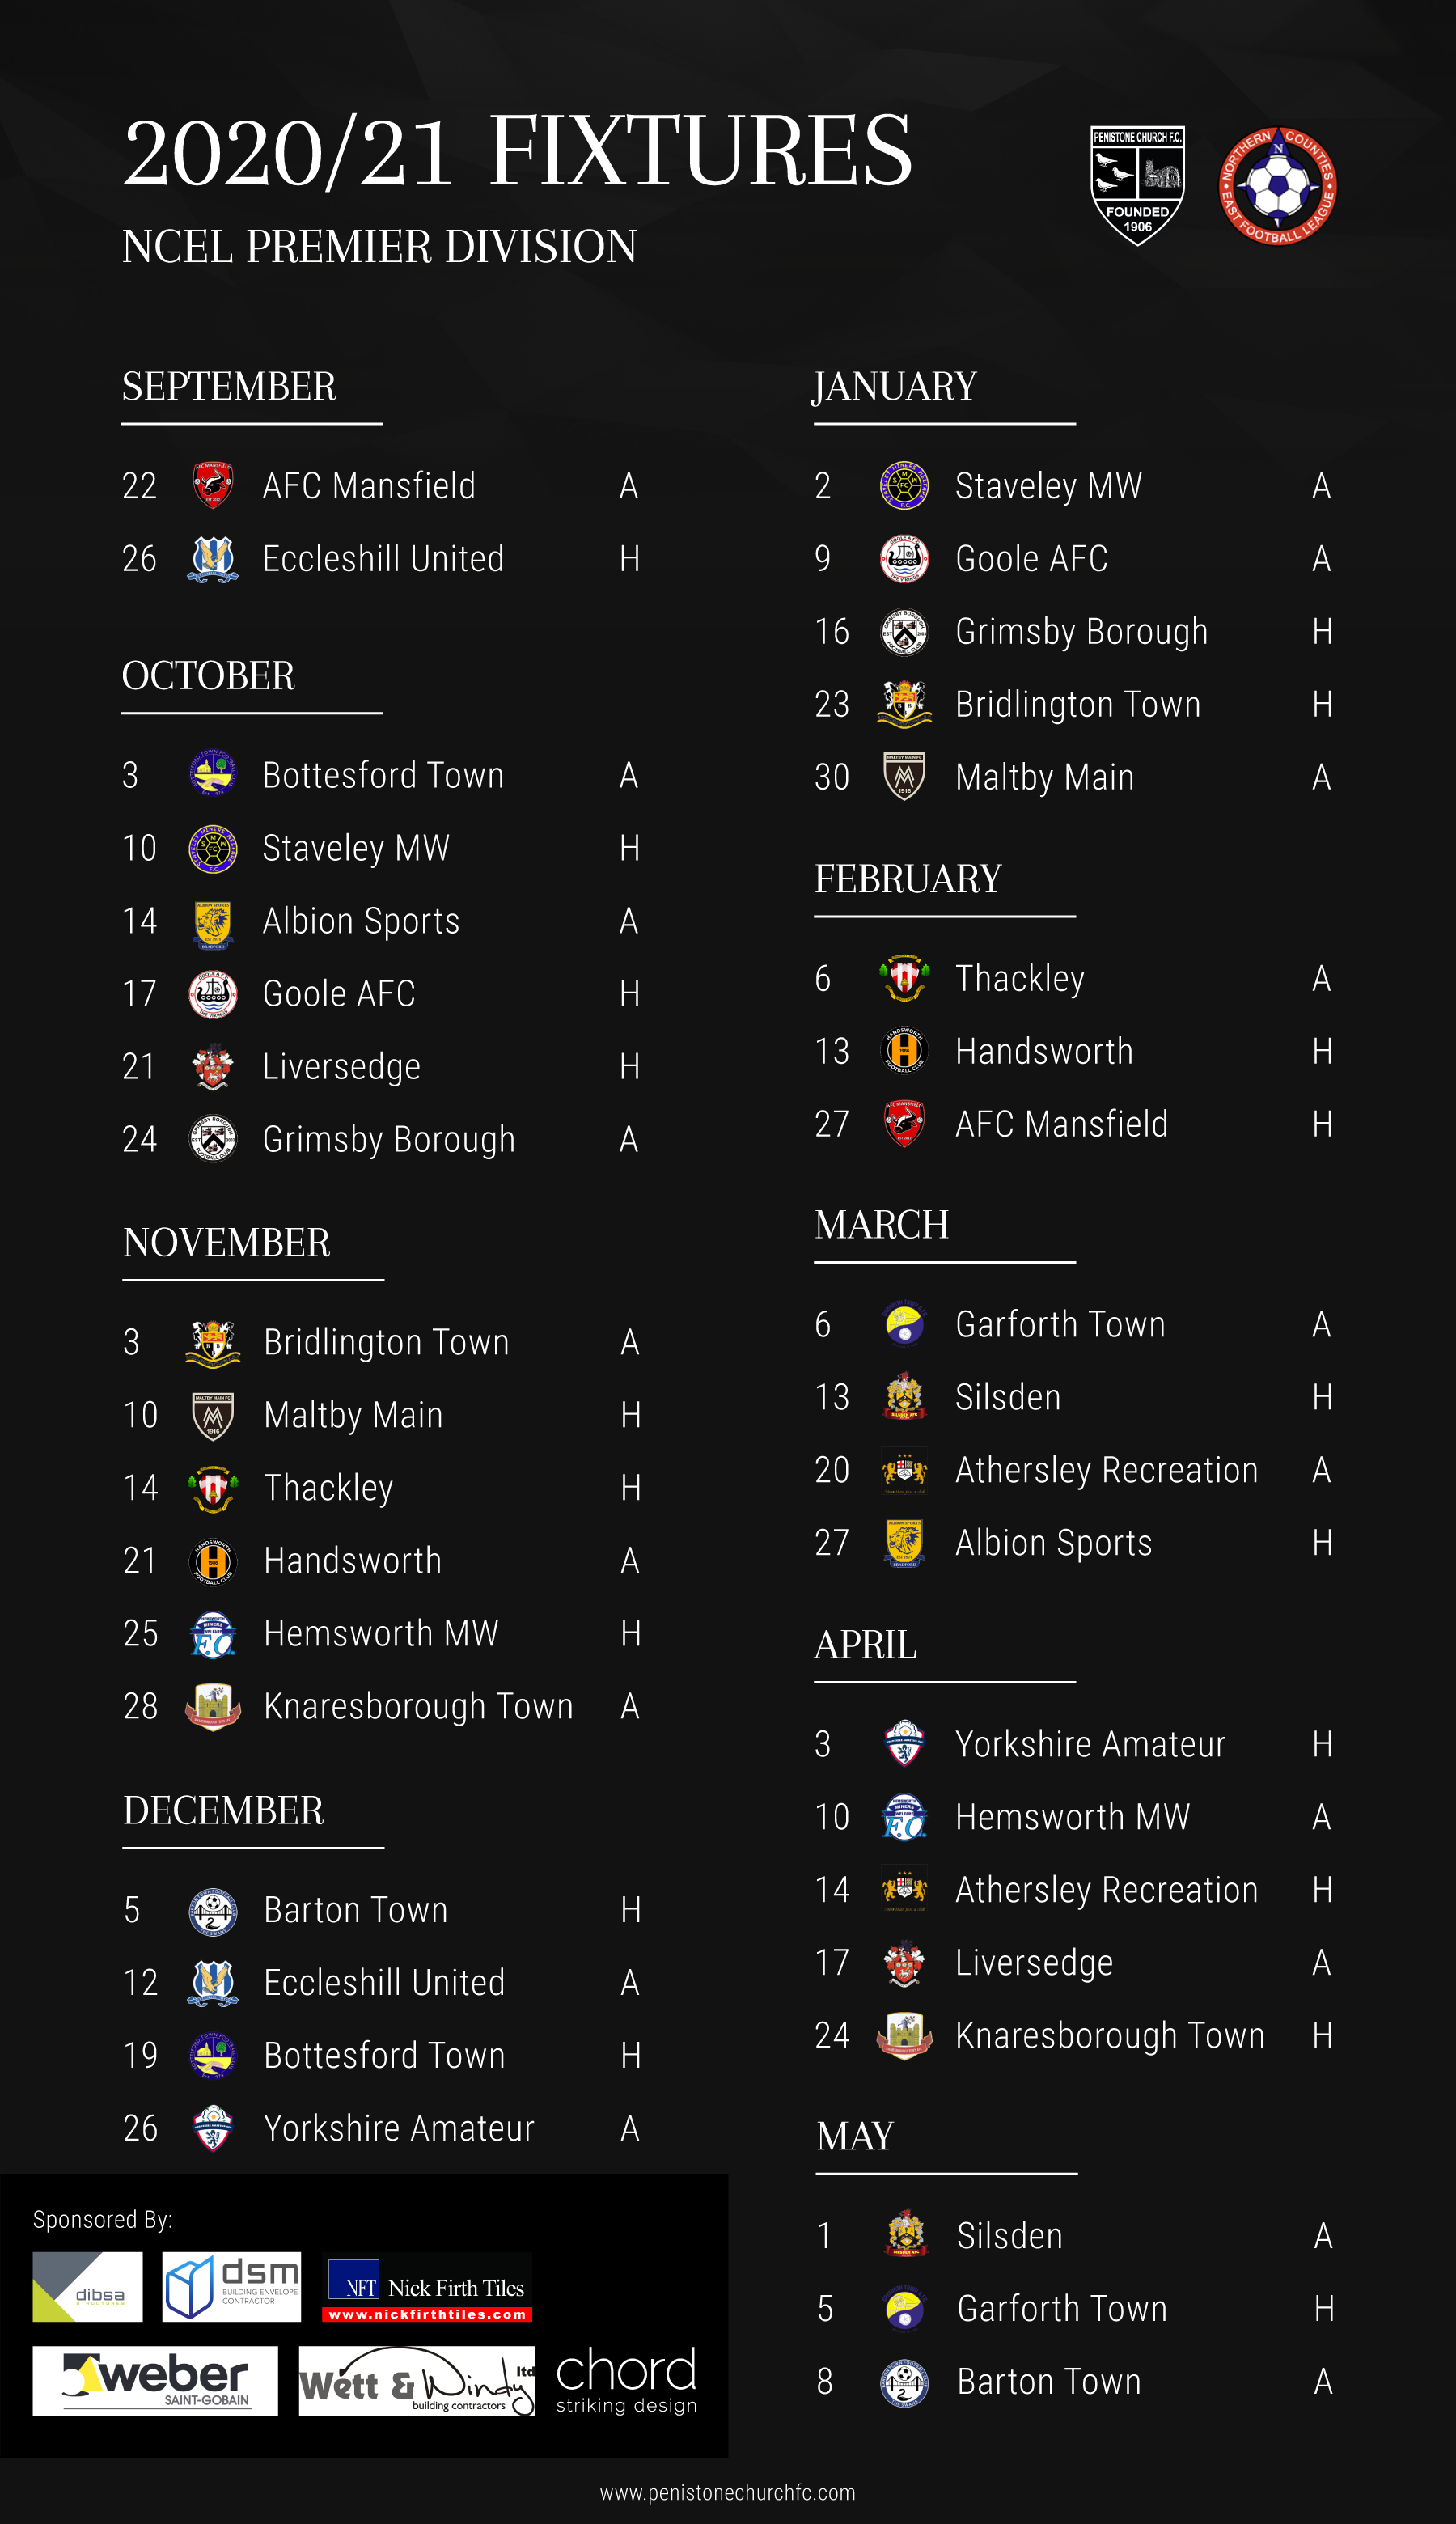 2020/21 Fixture List